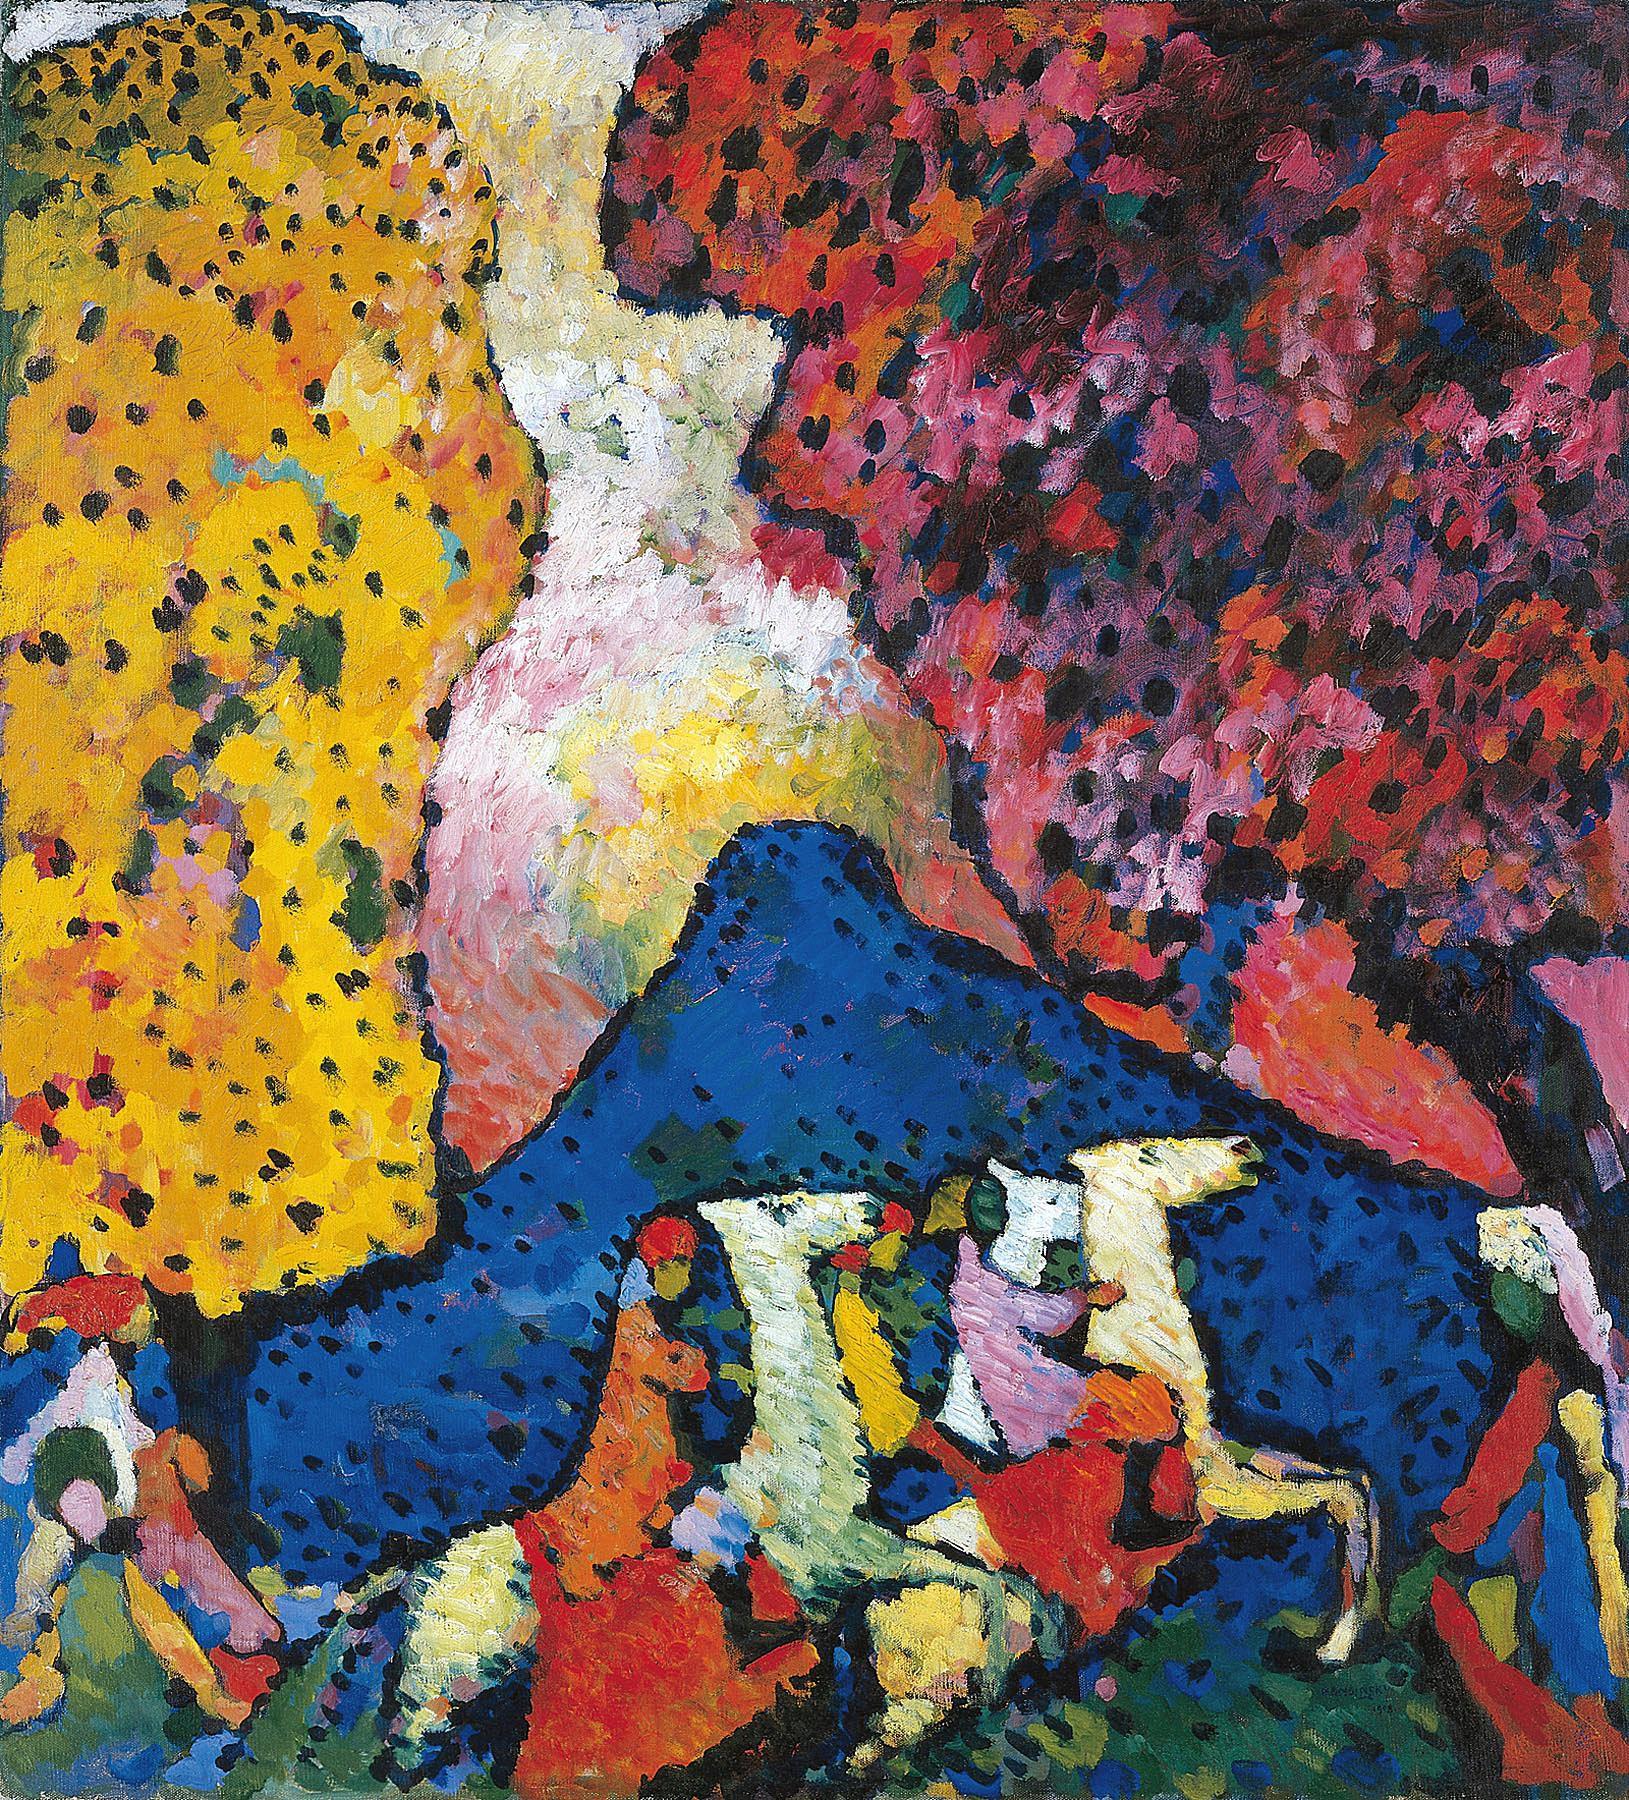 Wassily Kandinsky (Russian, 1866-1944) Wassily Kandinsky (Russian, 1866-1944). The Blue Mountain (Der blaue Berg), 1908-09. Oil on canvas. 41 3/4 x 38 in. (106 x 96.6 cm). Solomon R. Guggenheim Founding Collection, By gift 41.505. Solomon R. Guggenheim Museum, New York.